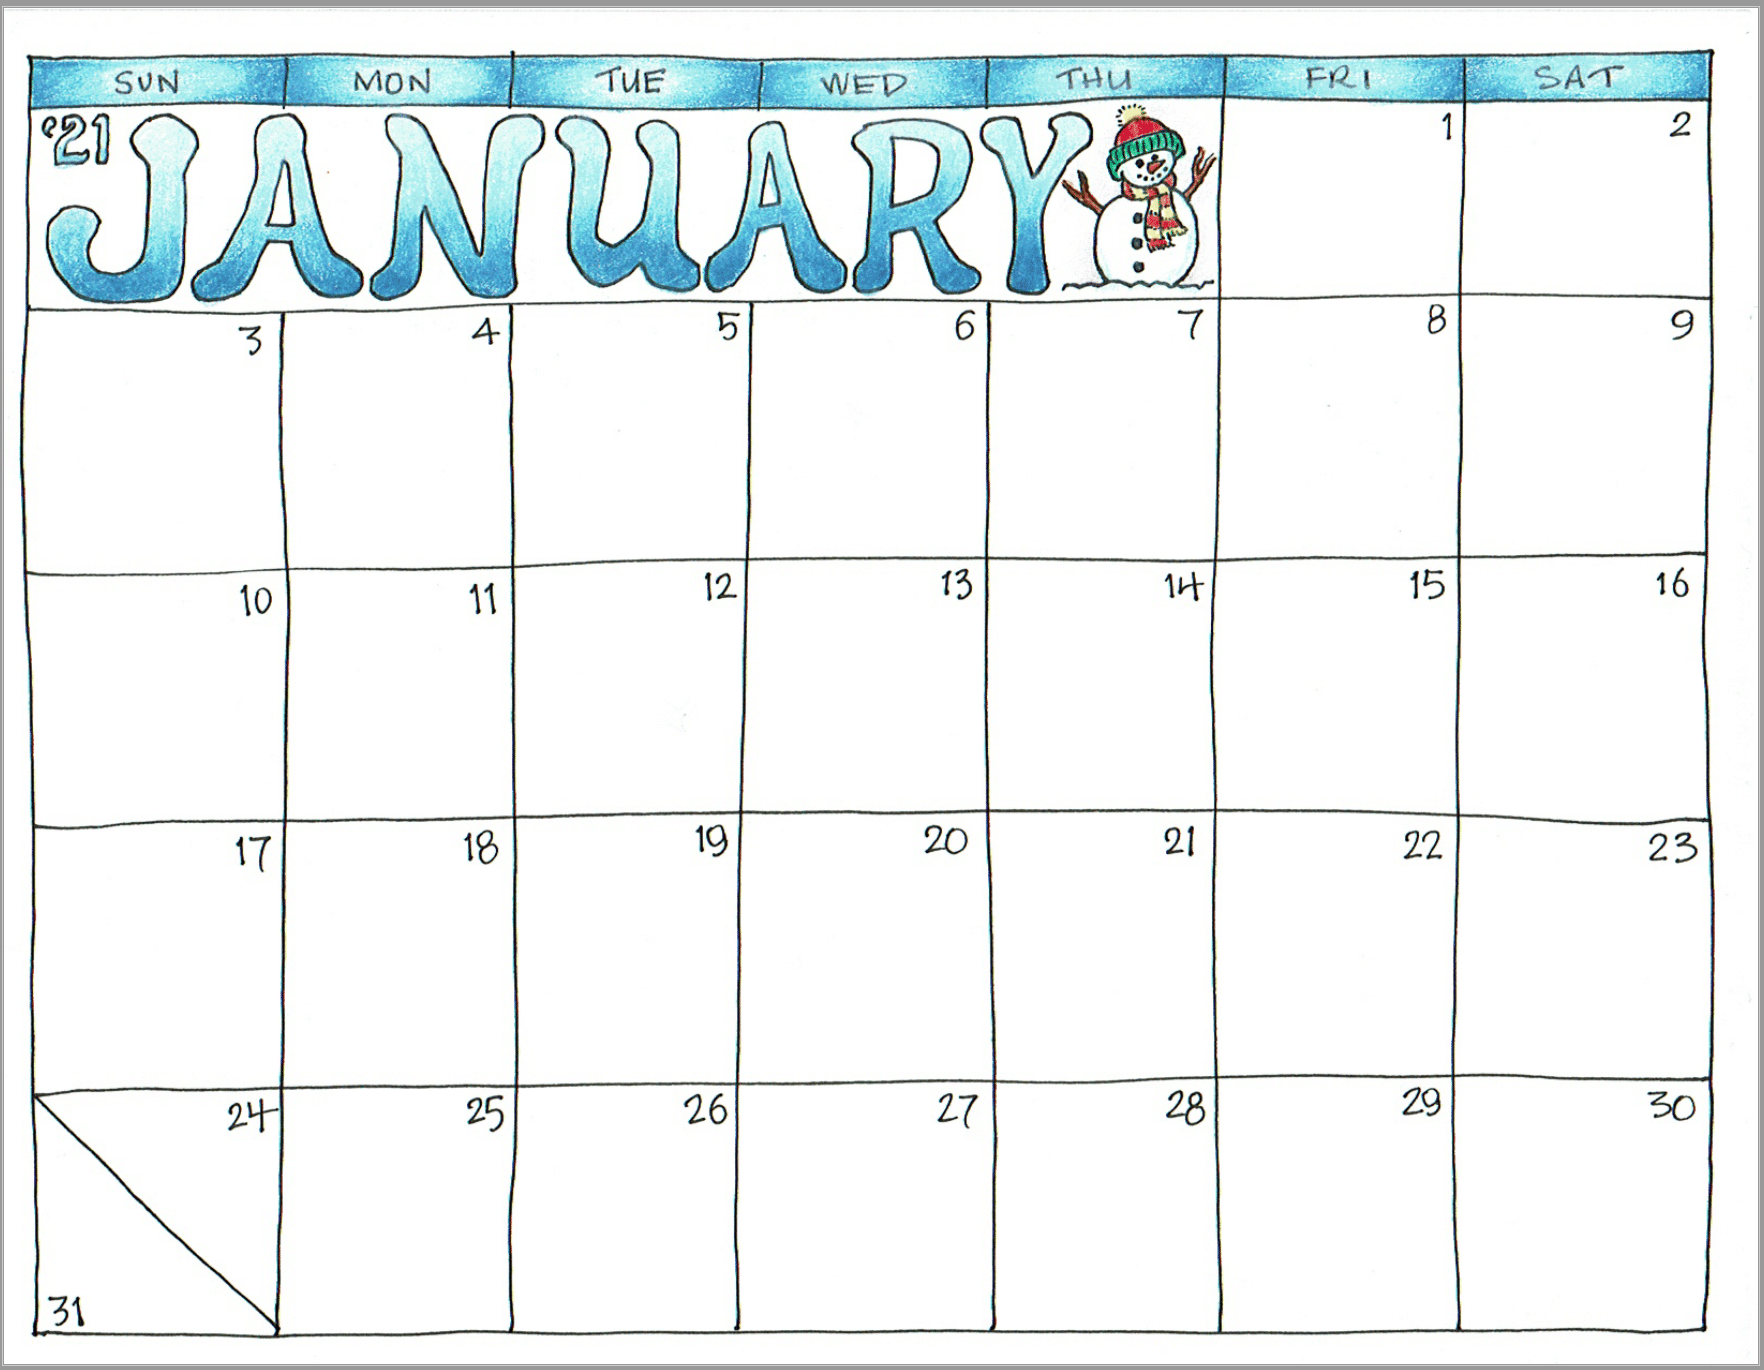 2021 Scrapbook Calendar - April